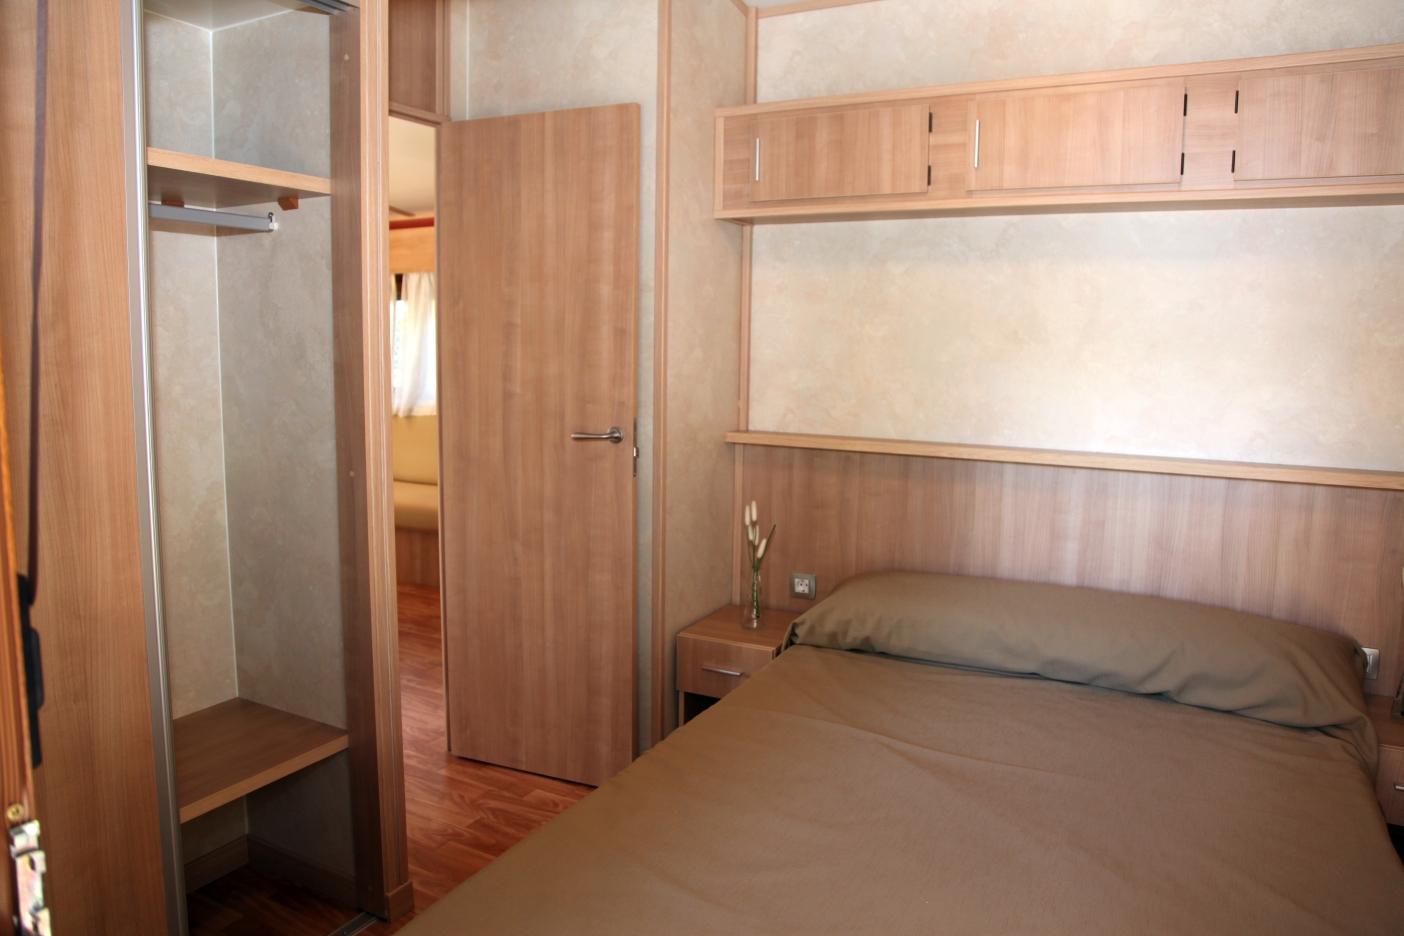 9100camping bolaso mobil home habitacion